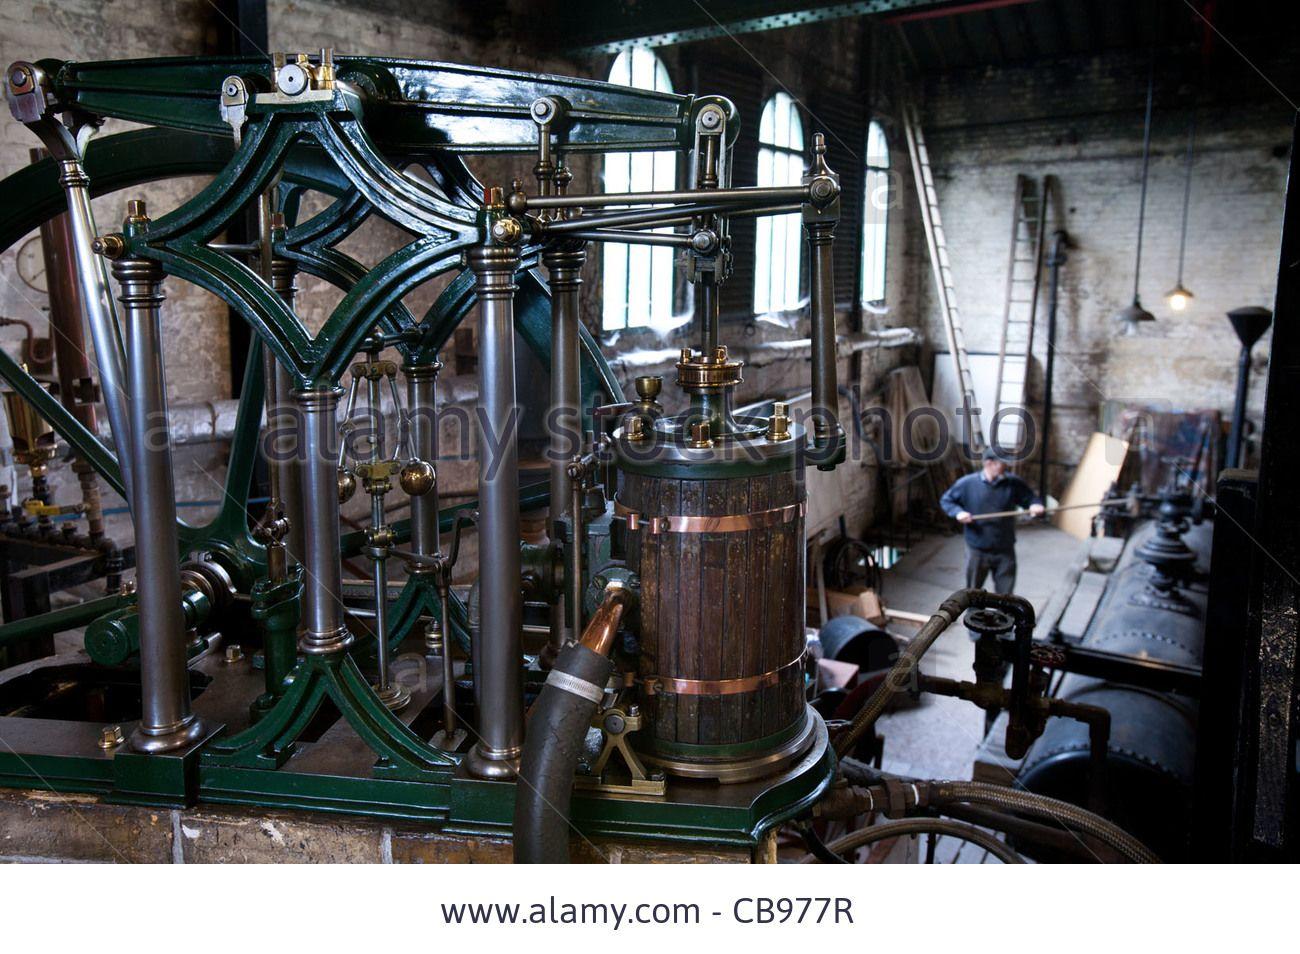 Headley beam engine, Old Pumping Station, Cambridge, UK Stock Photo